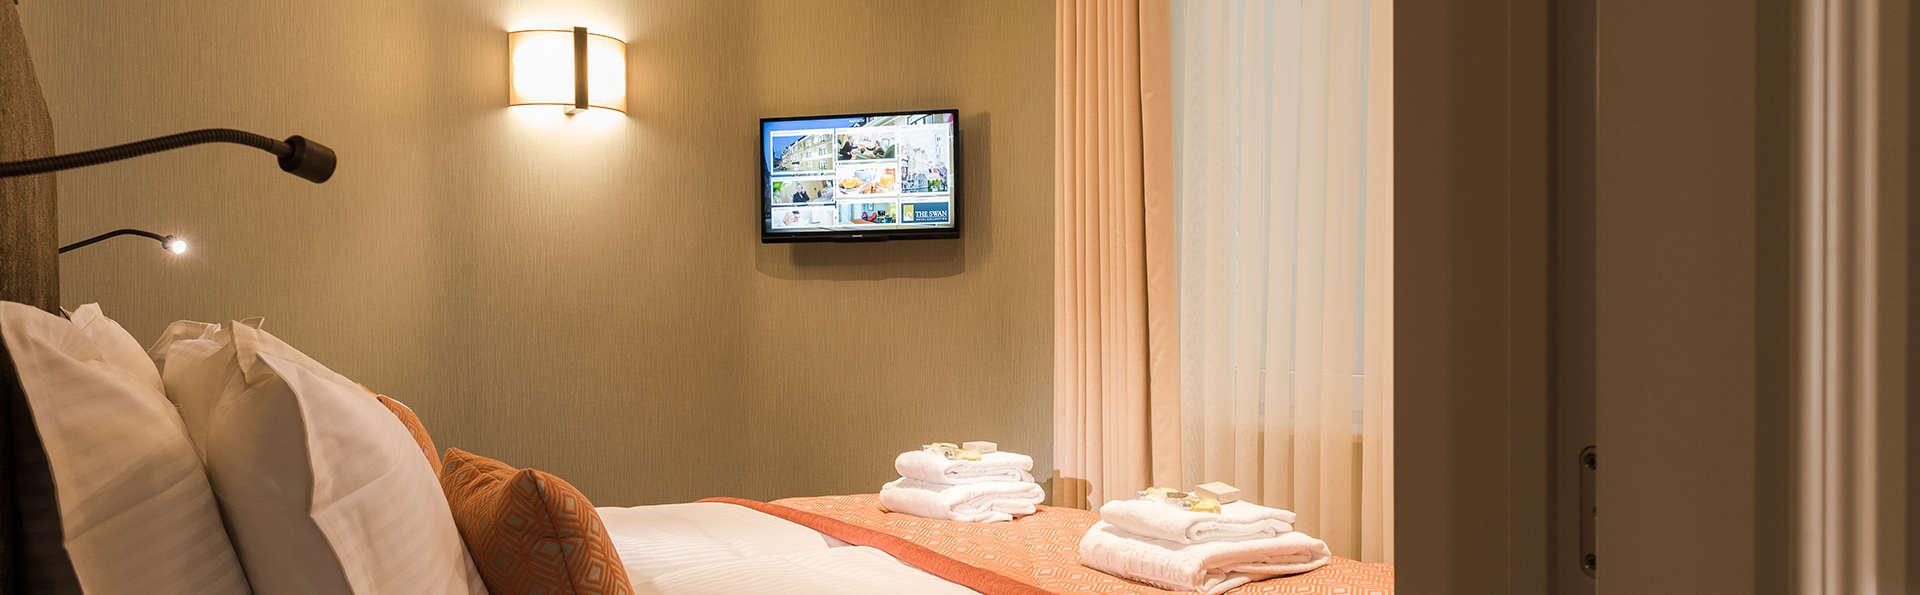 Hotel Aragon - EDIT_room7.jpg